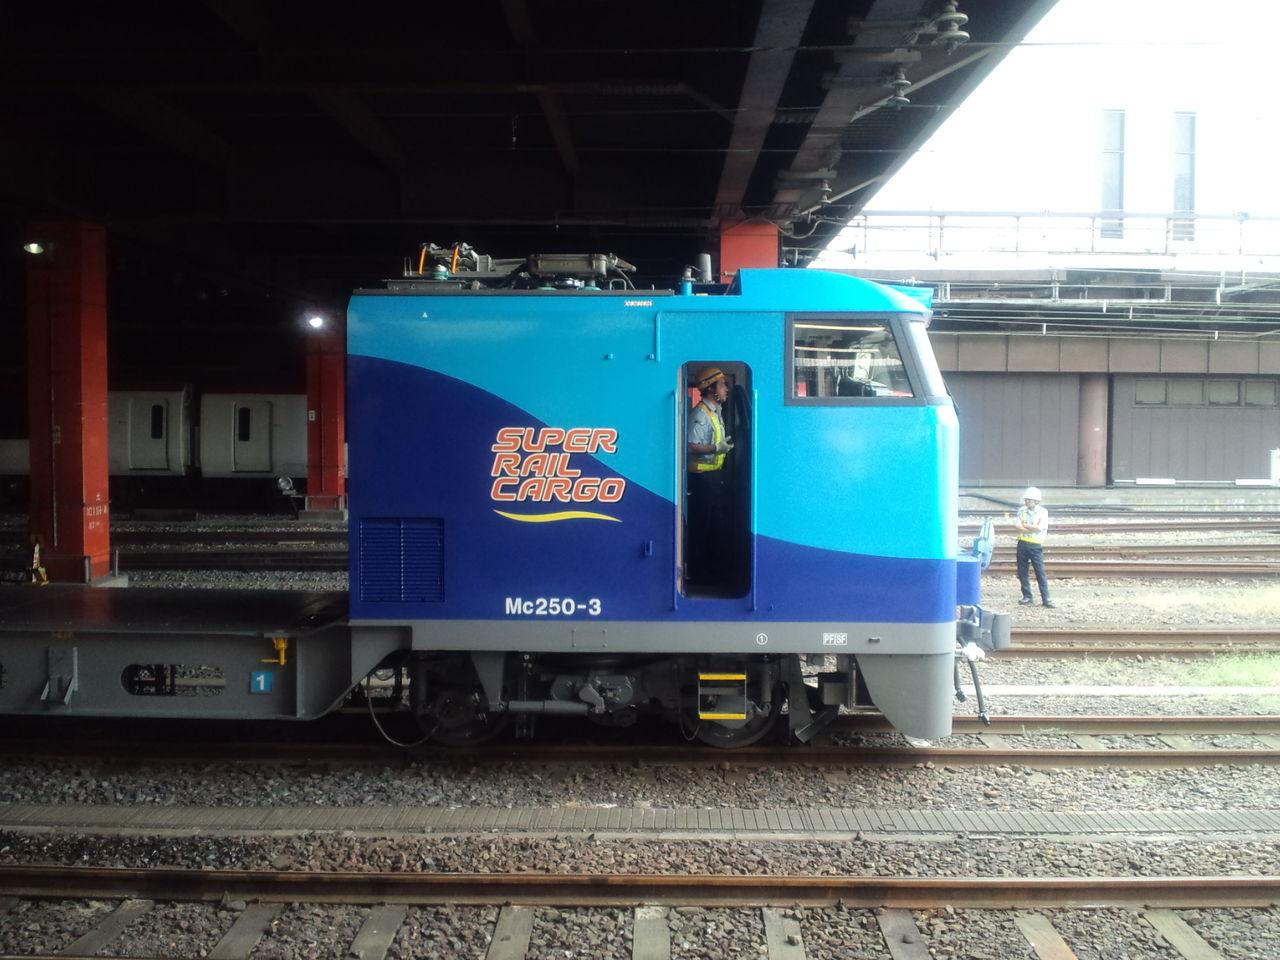 train caffe